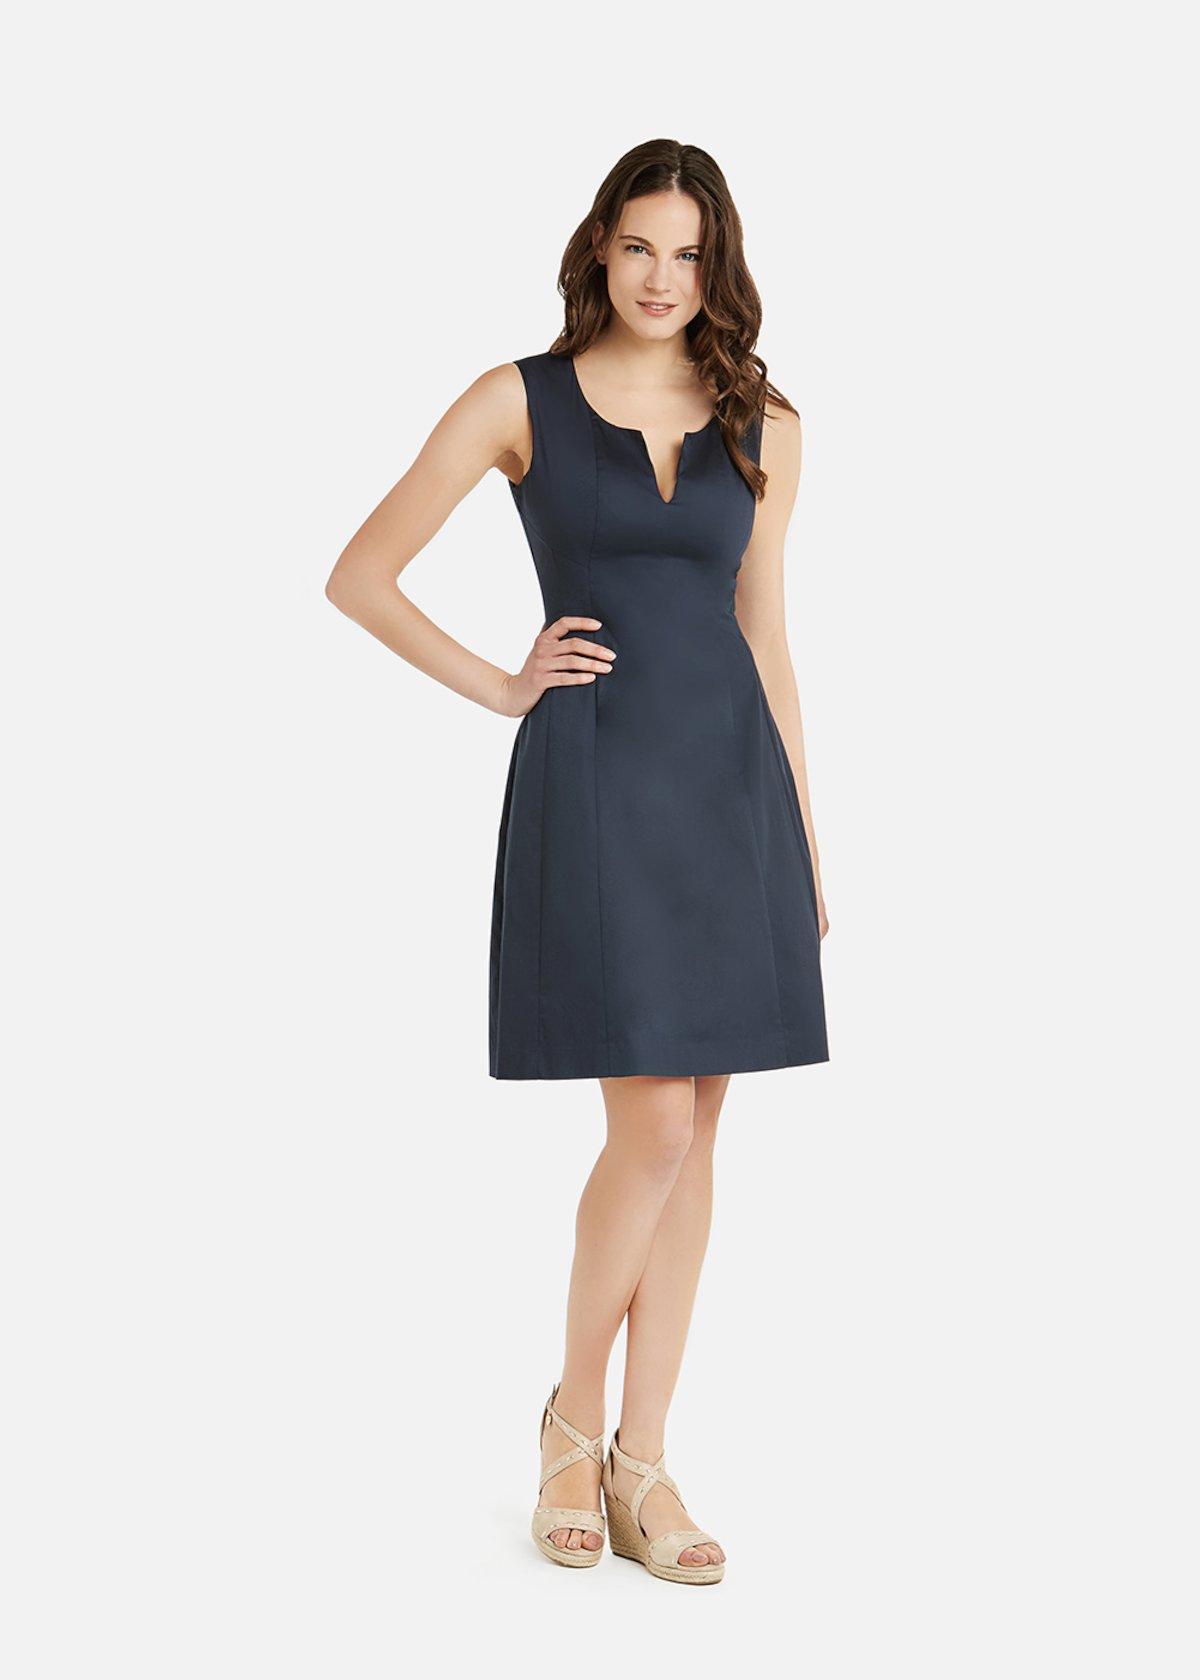 Astrid  cotton sateen midi dress - Medium Blue